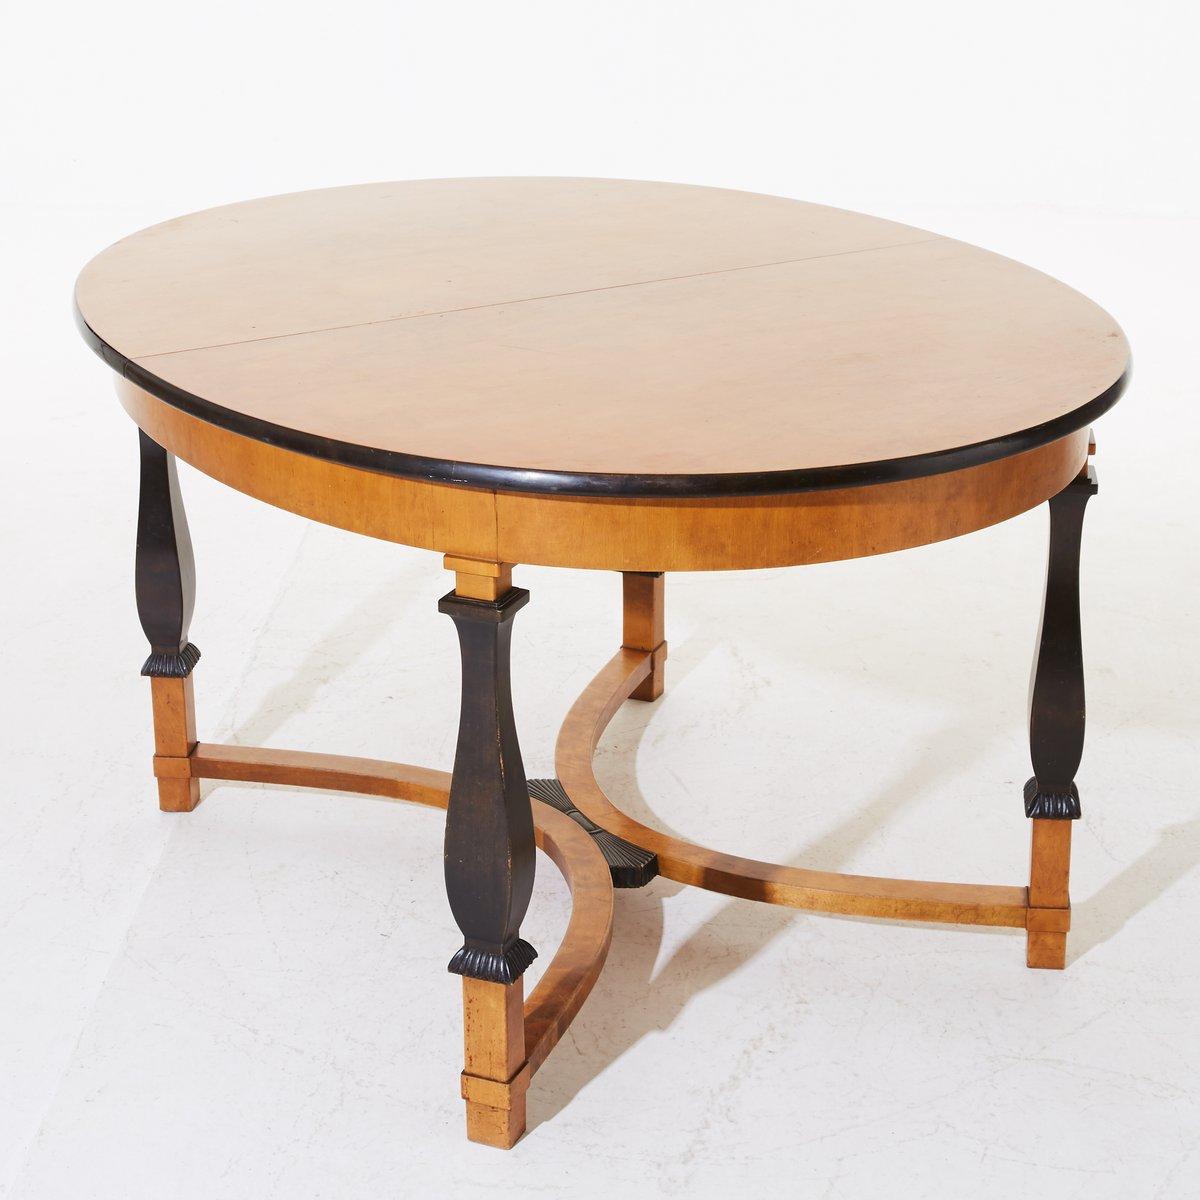 Haga Extendable Oval Dining Table By Carl Malmsten For Nordiska Kompaniet 1920s